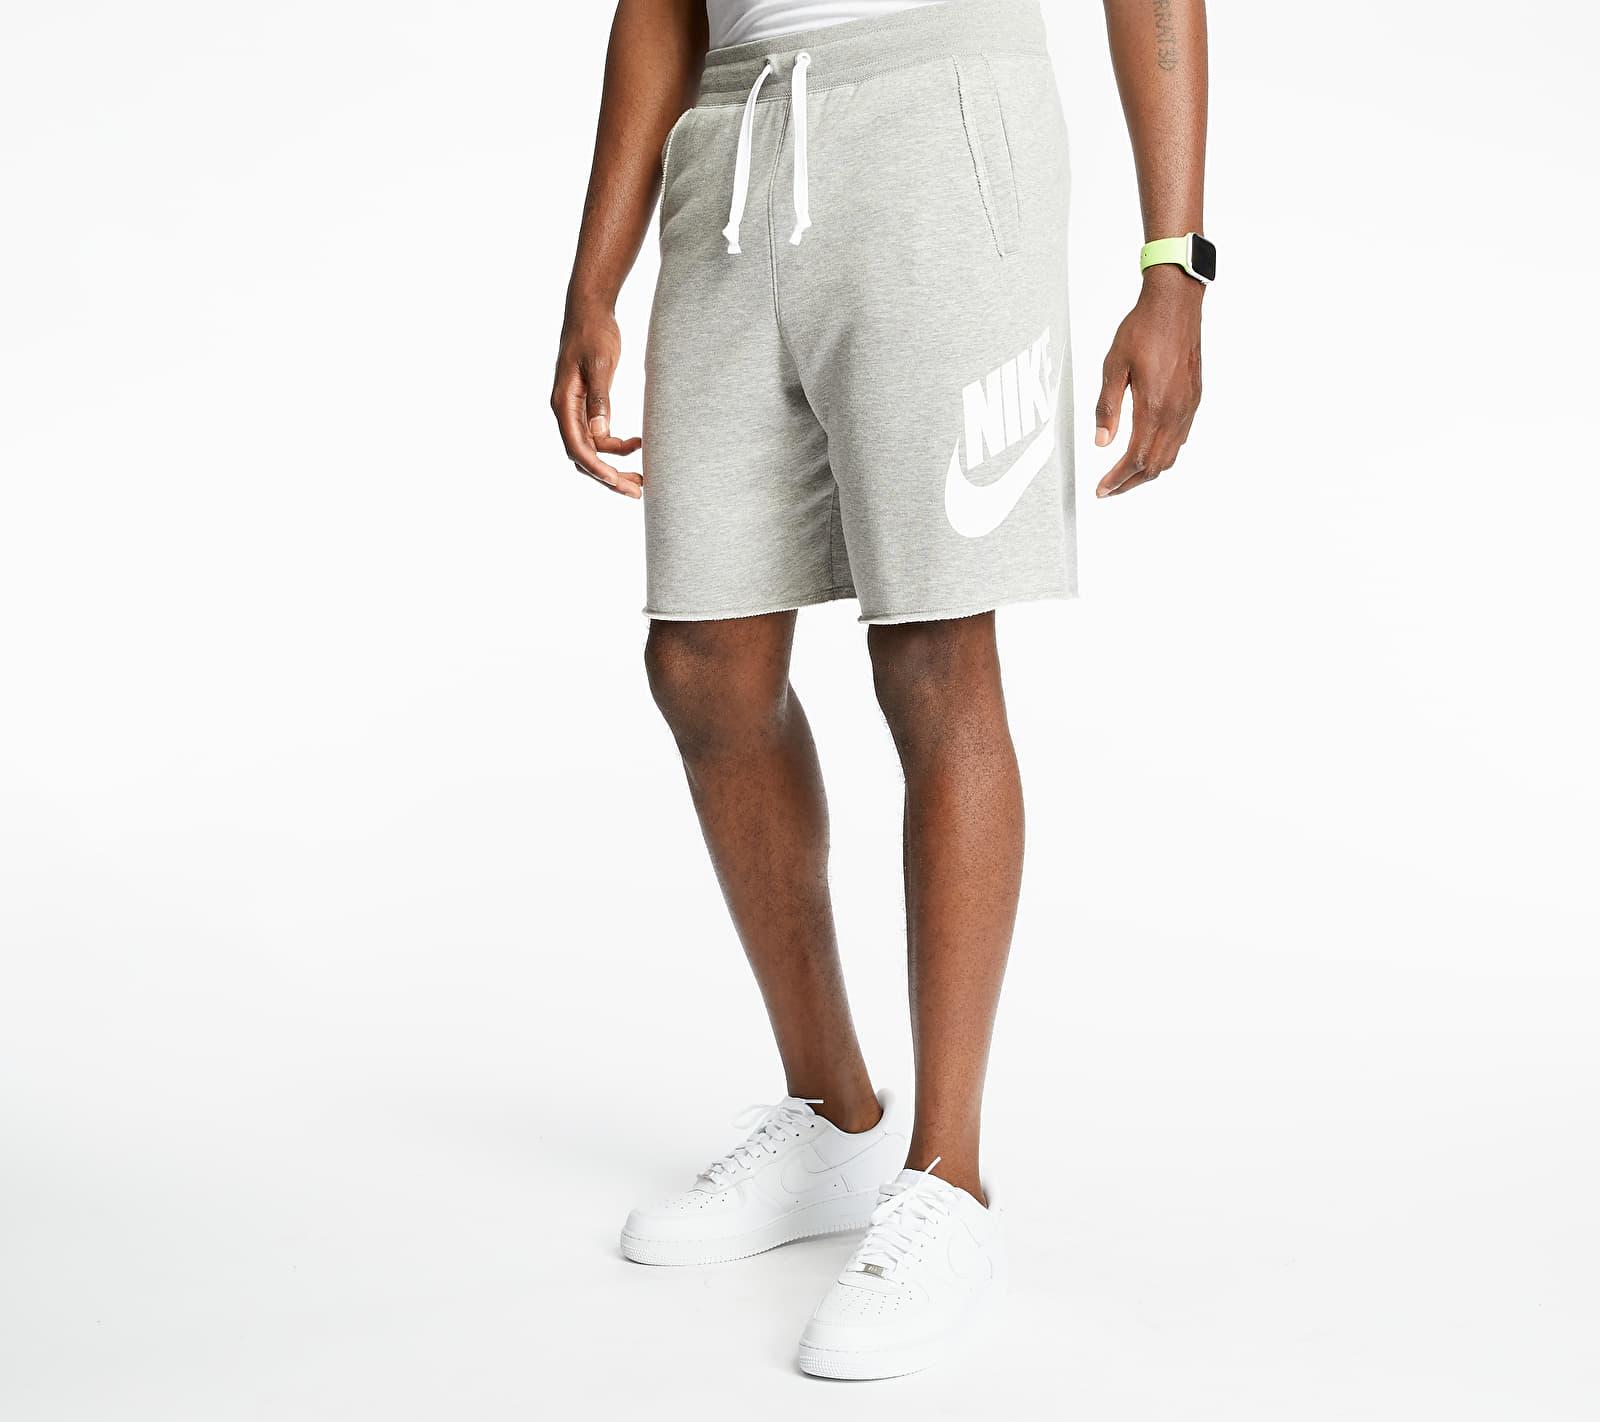 Nike Sportswear SCE Ft Alumni Shorts Dk Grey Heather/ Dk Grey Heather/ White, Gray